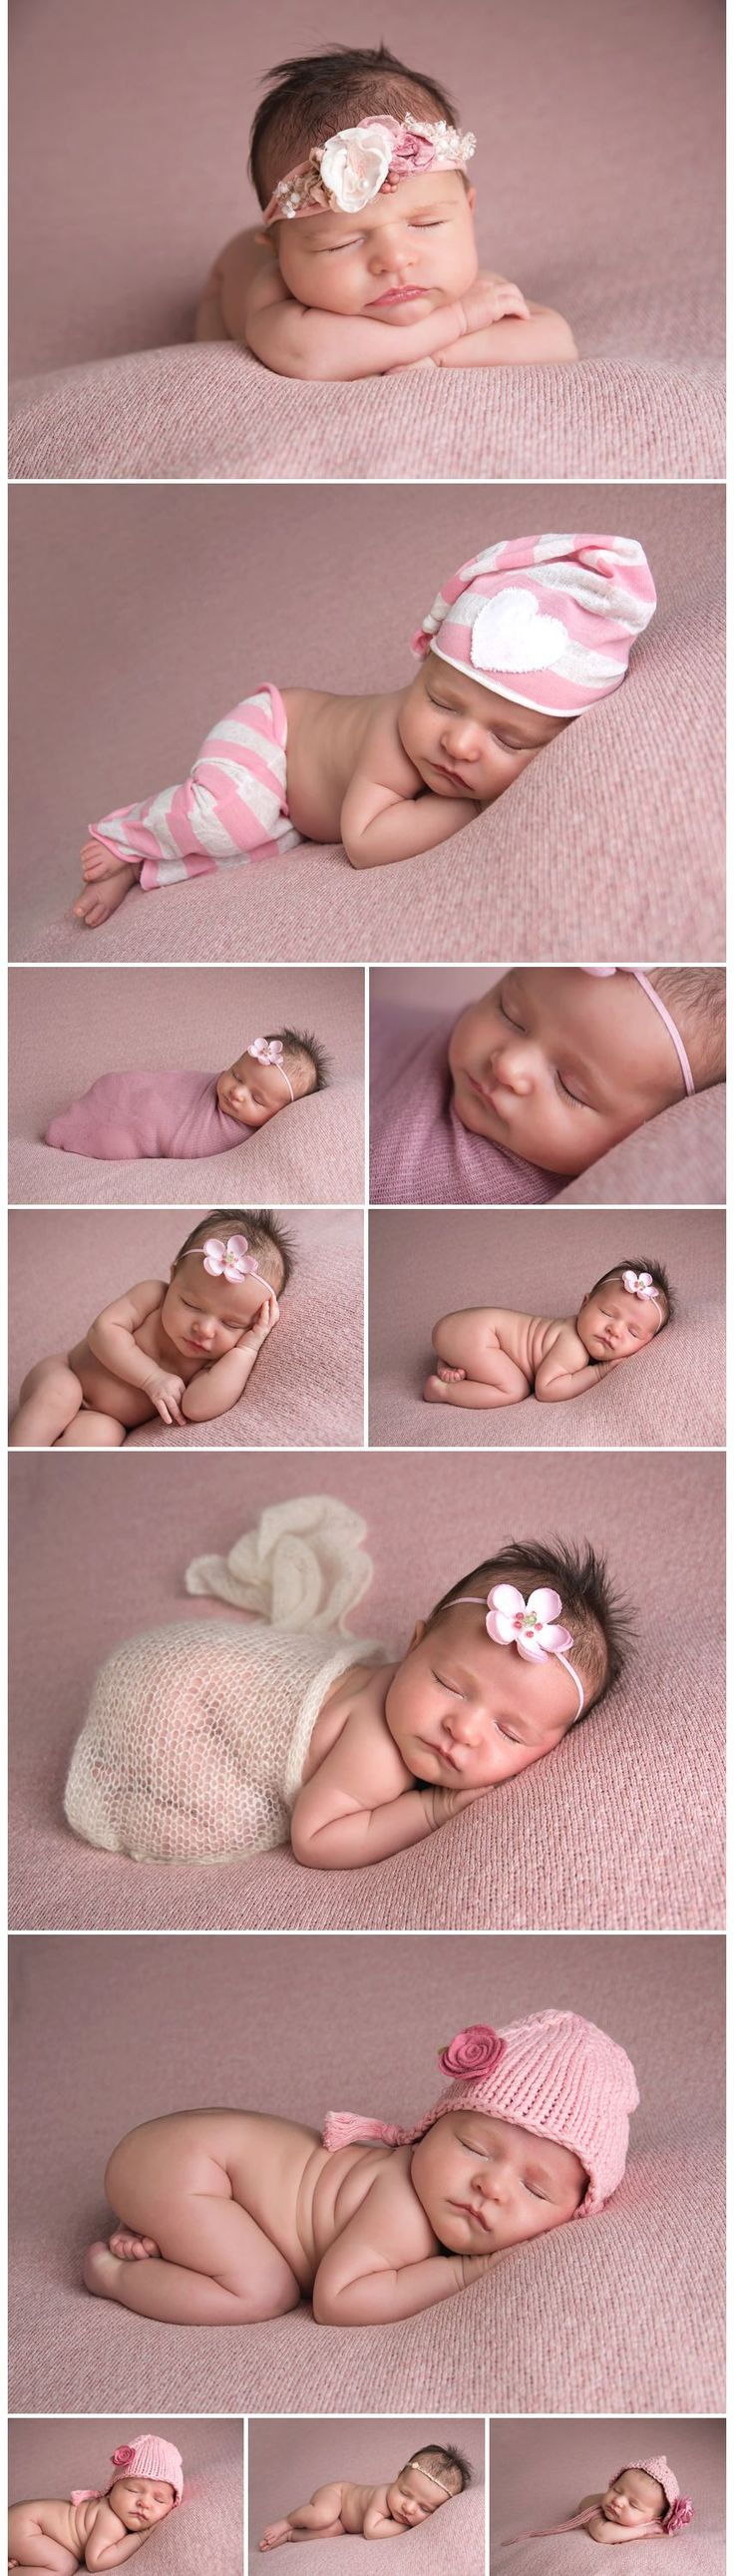 Las Vegas Newborn Photographer | 5 Week Beauty | Susy Martinez Photography